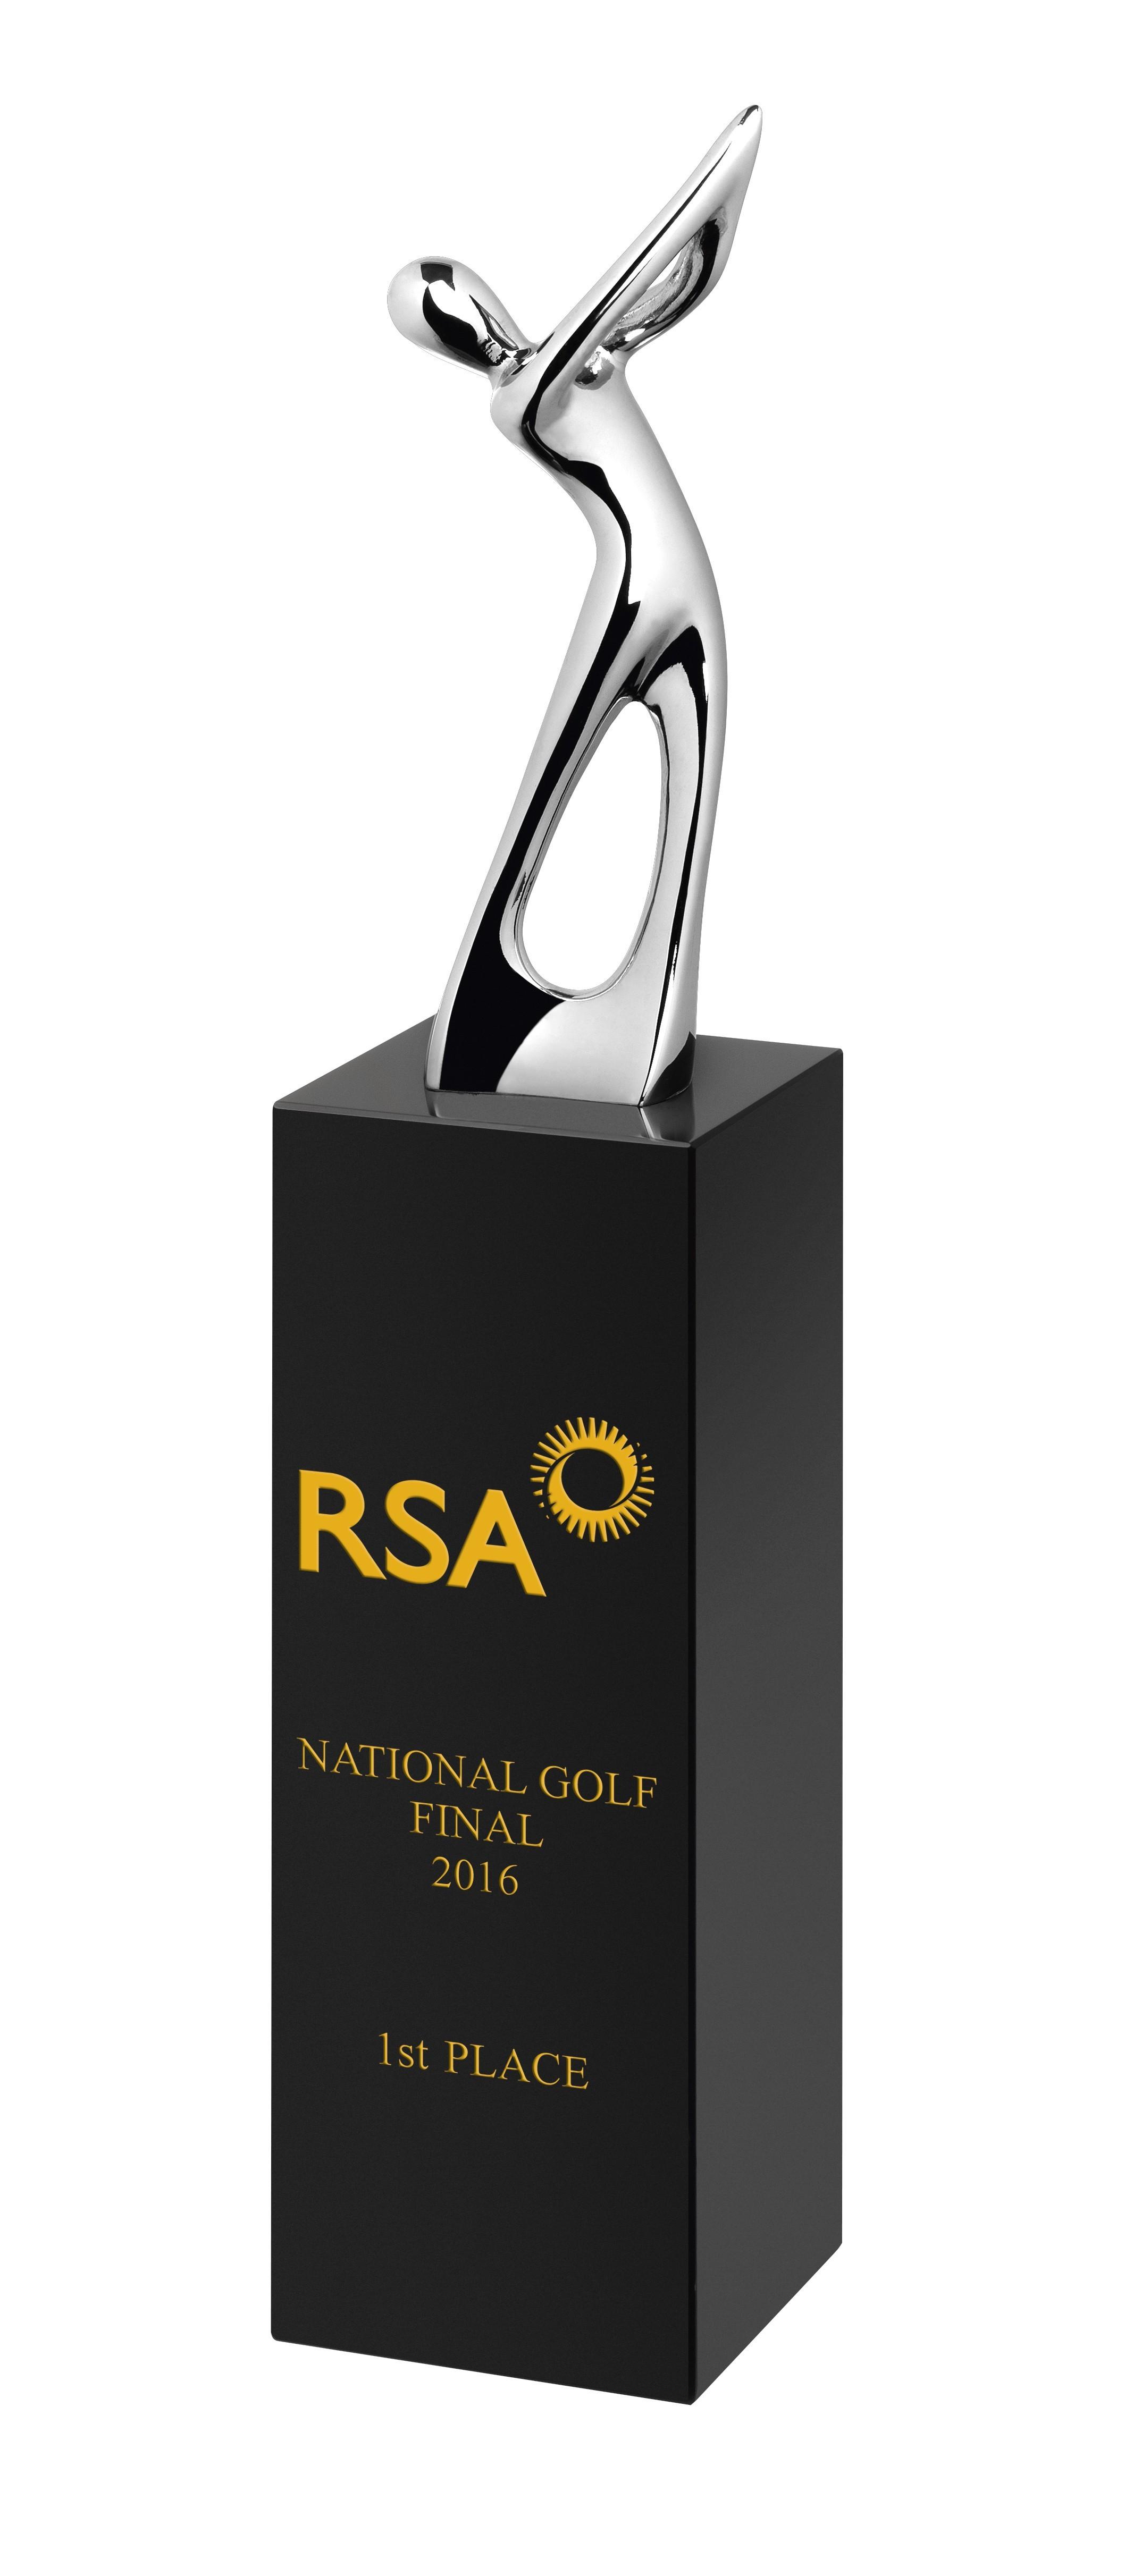 22cm Blk Crystal and Metal Golfer Award